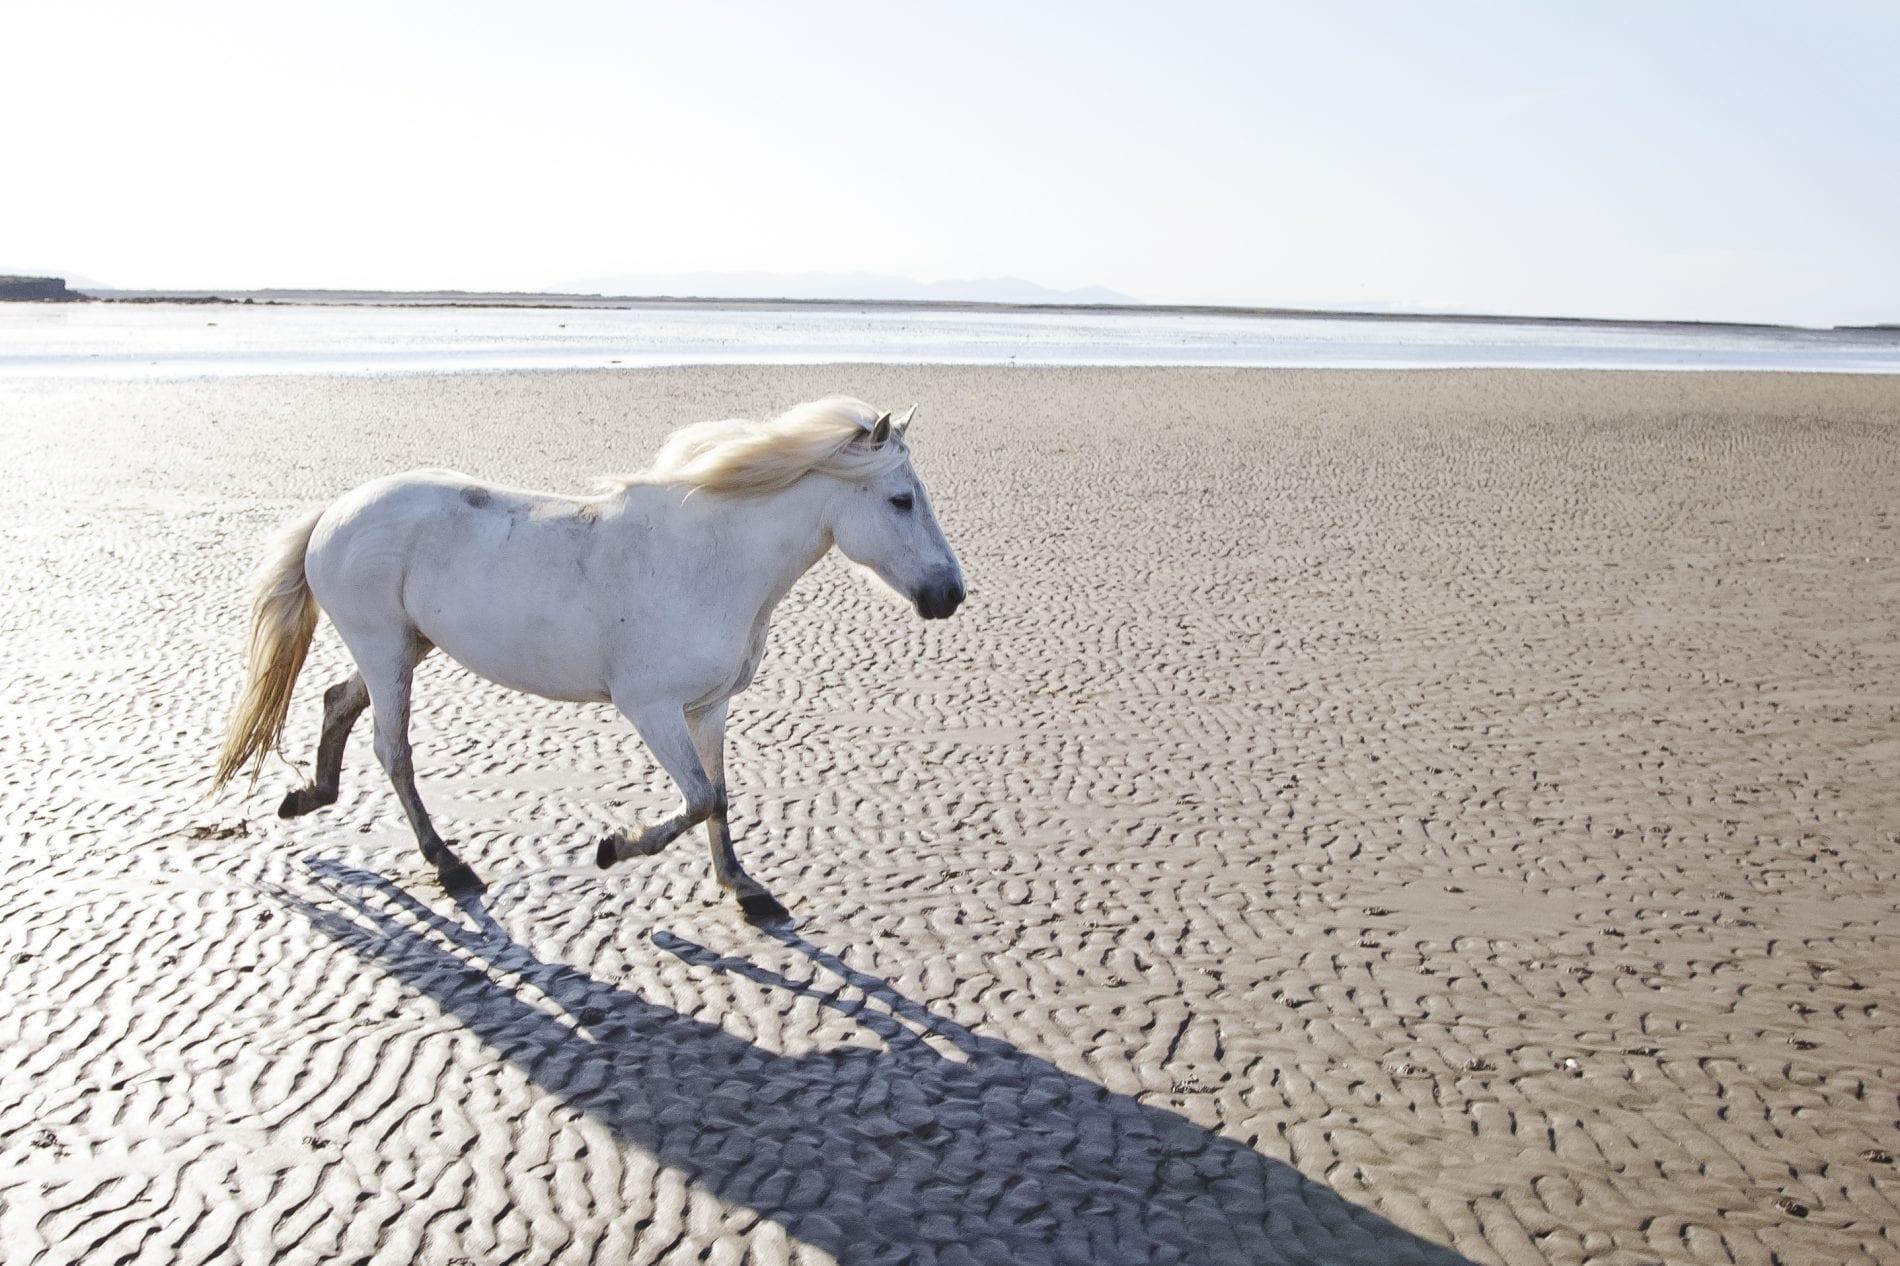 One horse on a light sand coloured beach in Snæfellsnes peninsula